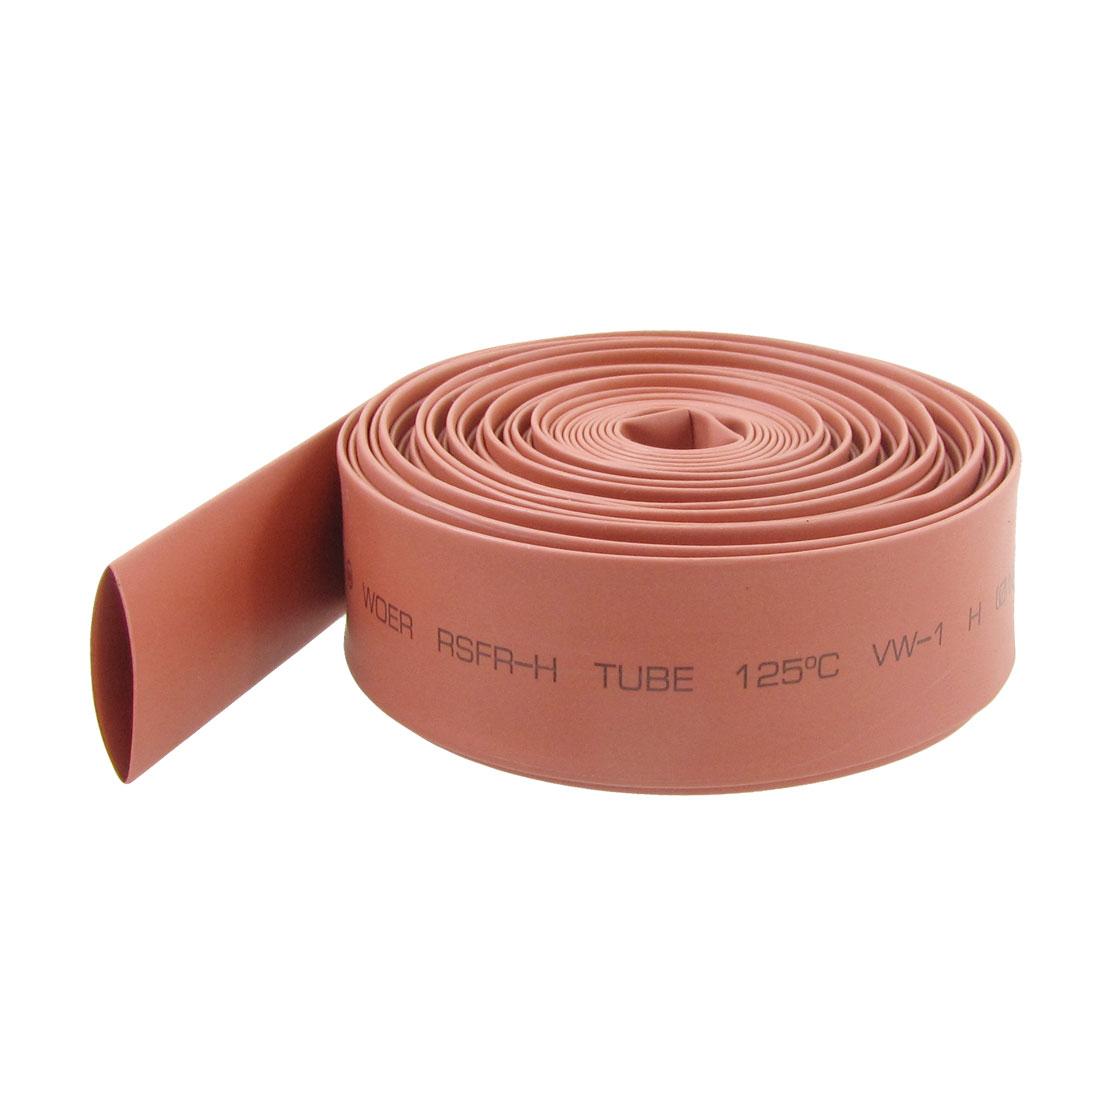 16mm Diameter 2:1 Ratio Red Polyolefin Heat Shrinkable Tube 6M